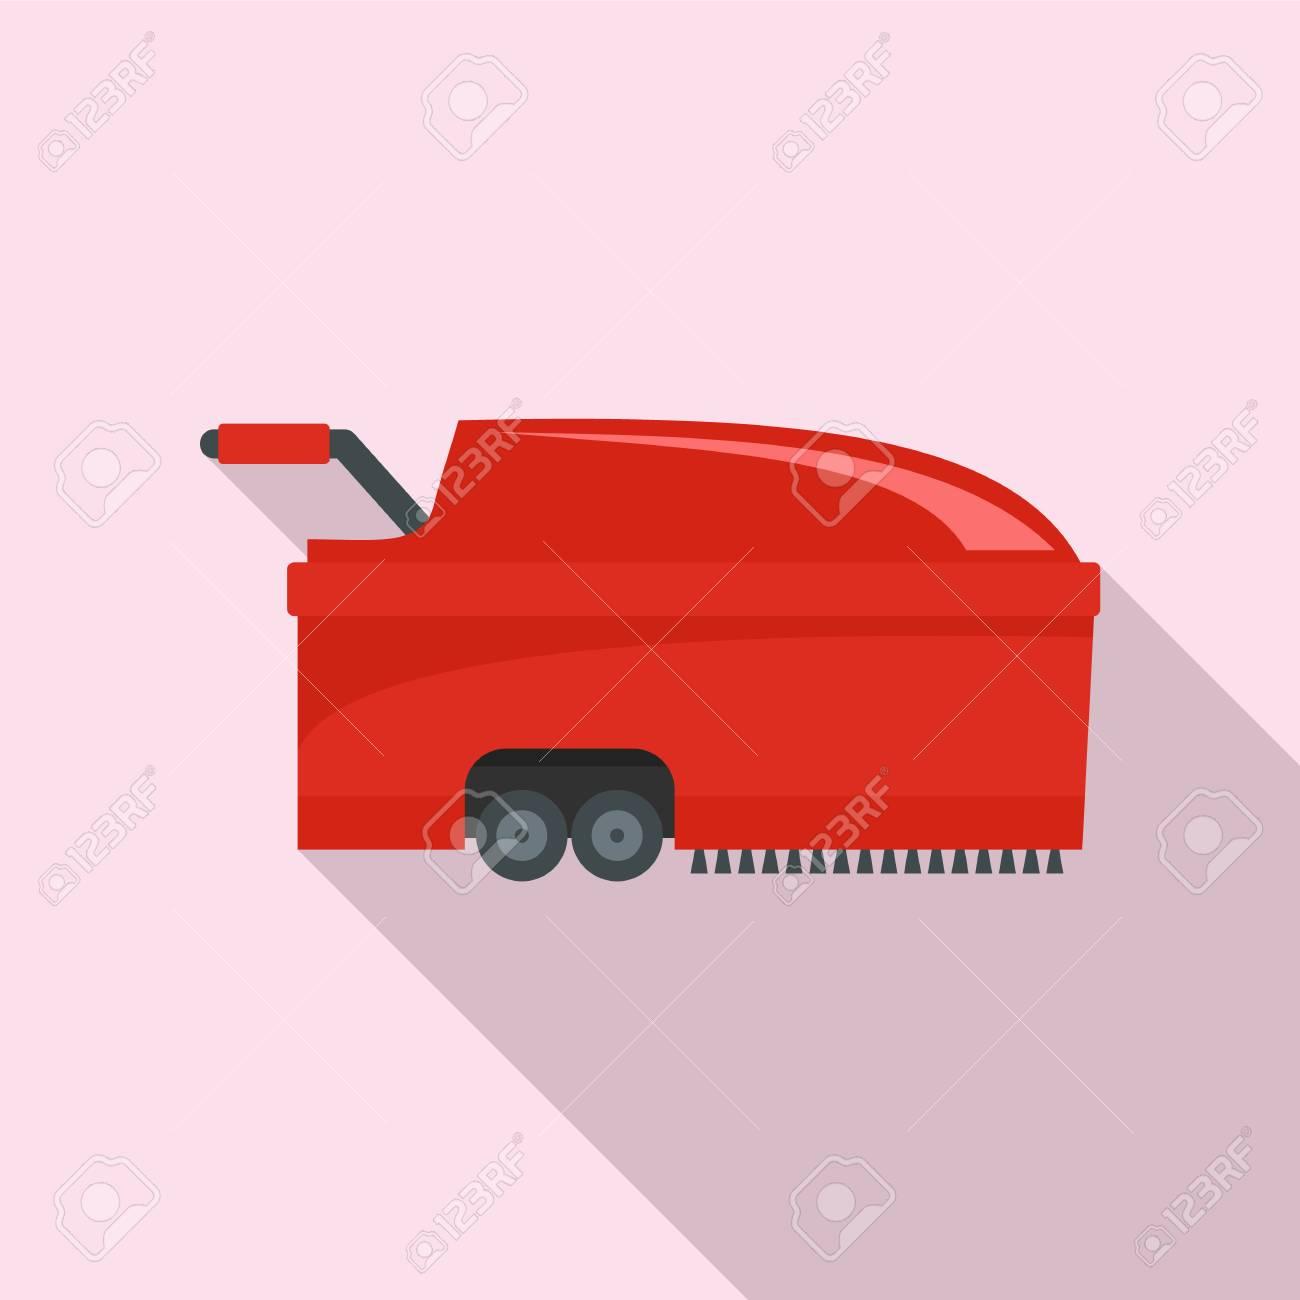 Hall vacuum cleaner icon. Flat illustration of hall vacuum cleaner vector icon for web design - 112307895